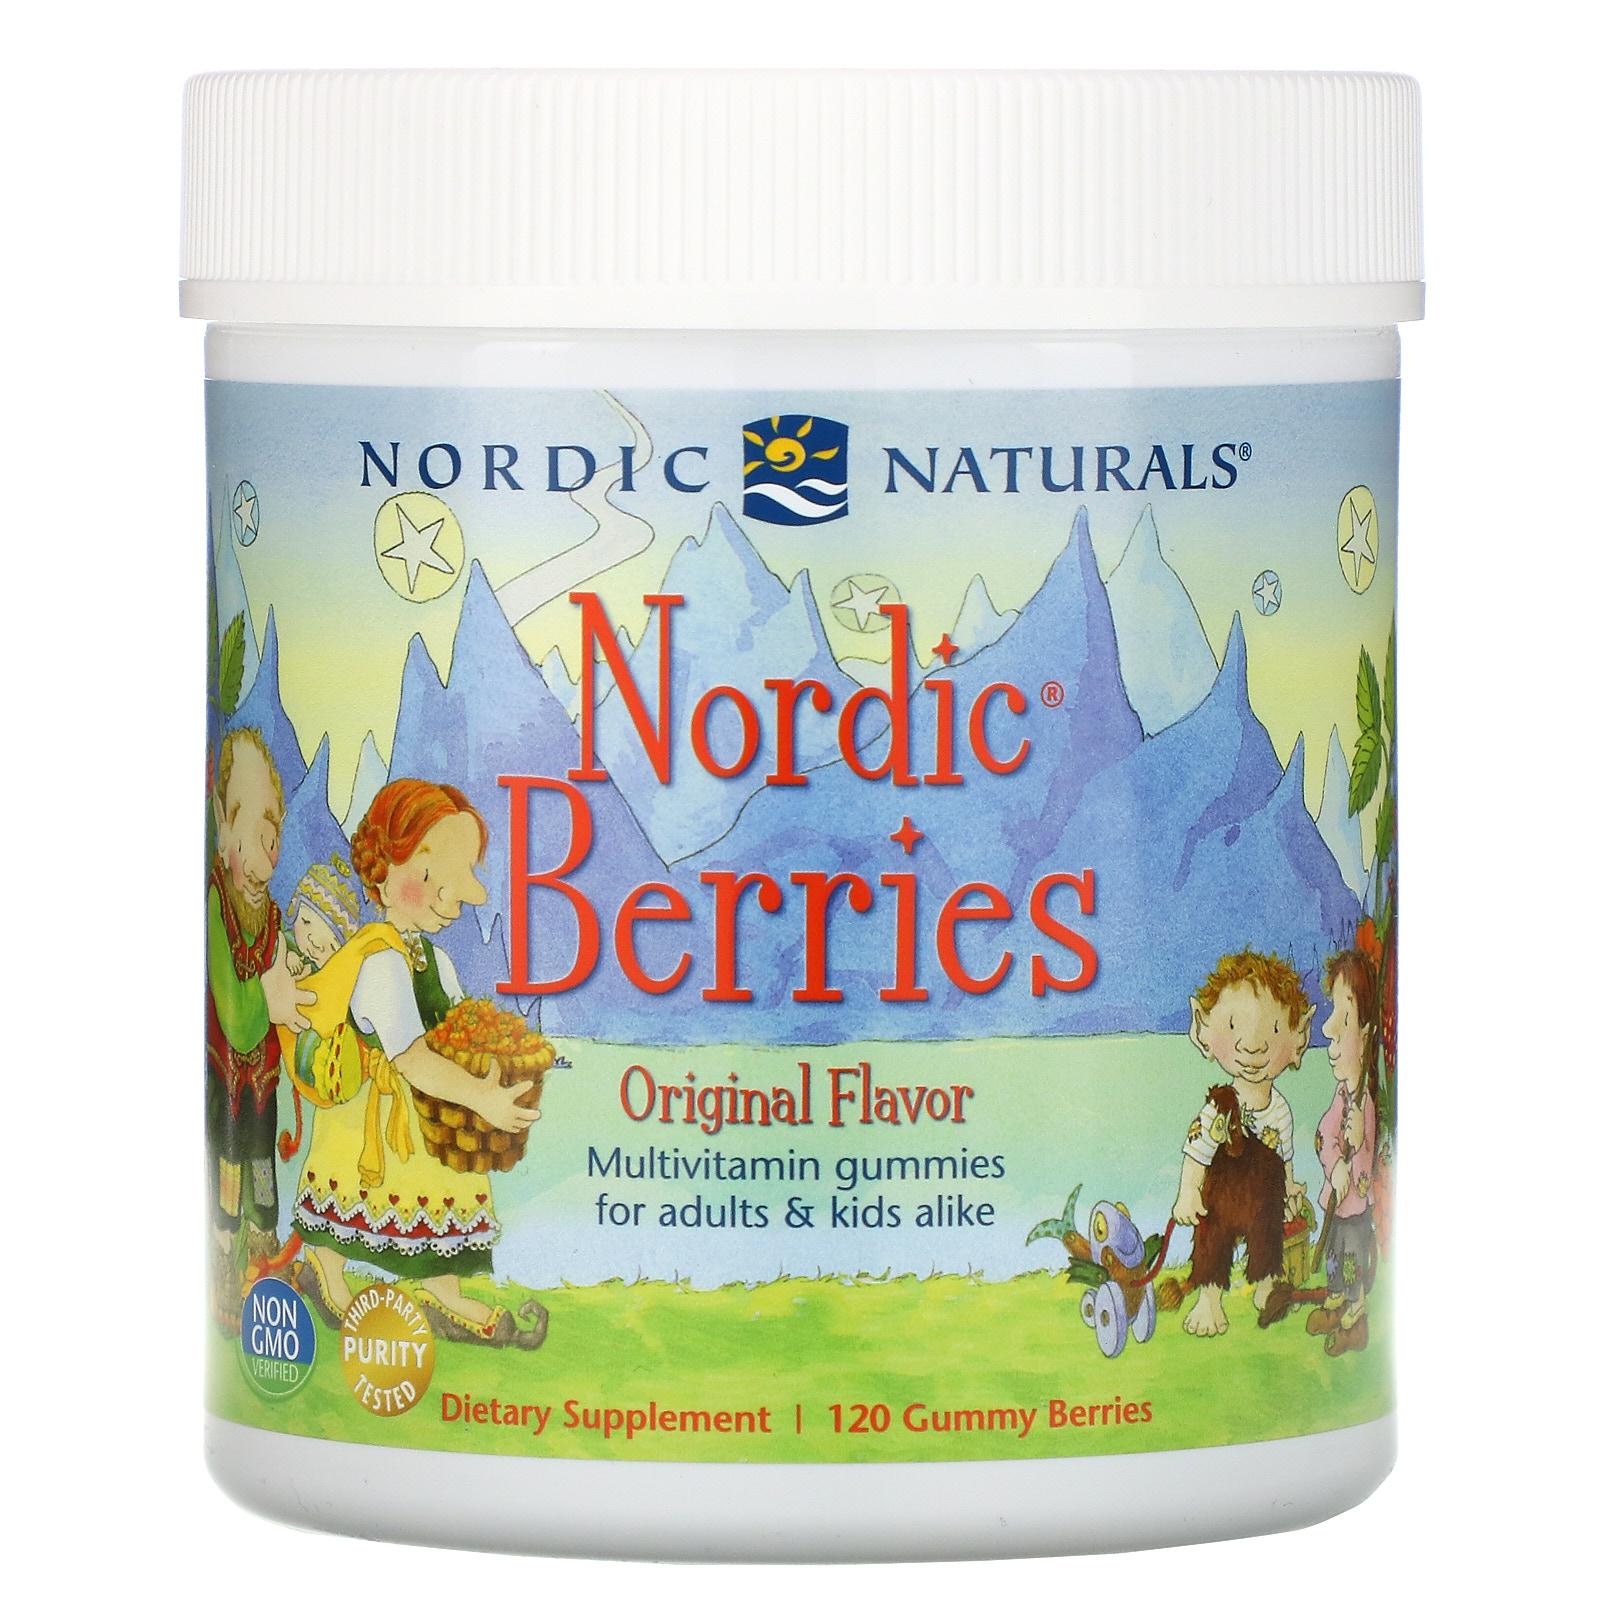 Nordic Naturals Nordic Berries Multivitamin, sladkokysele - 120 gumových bombonu